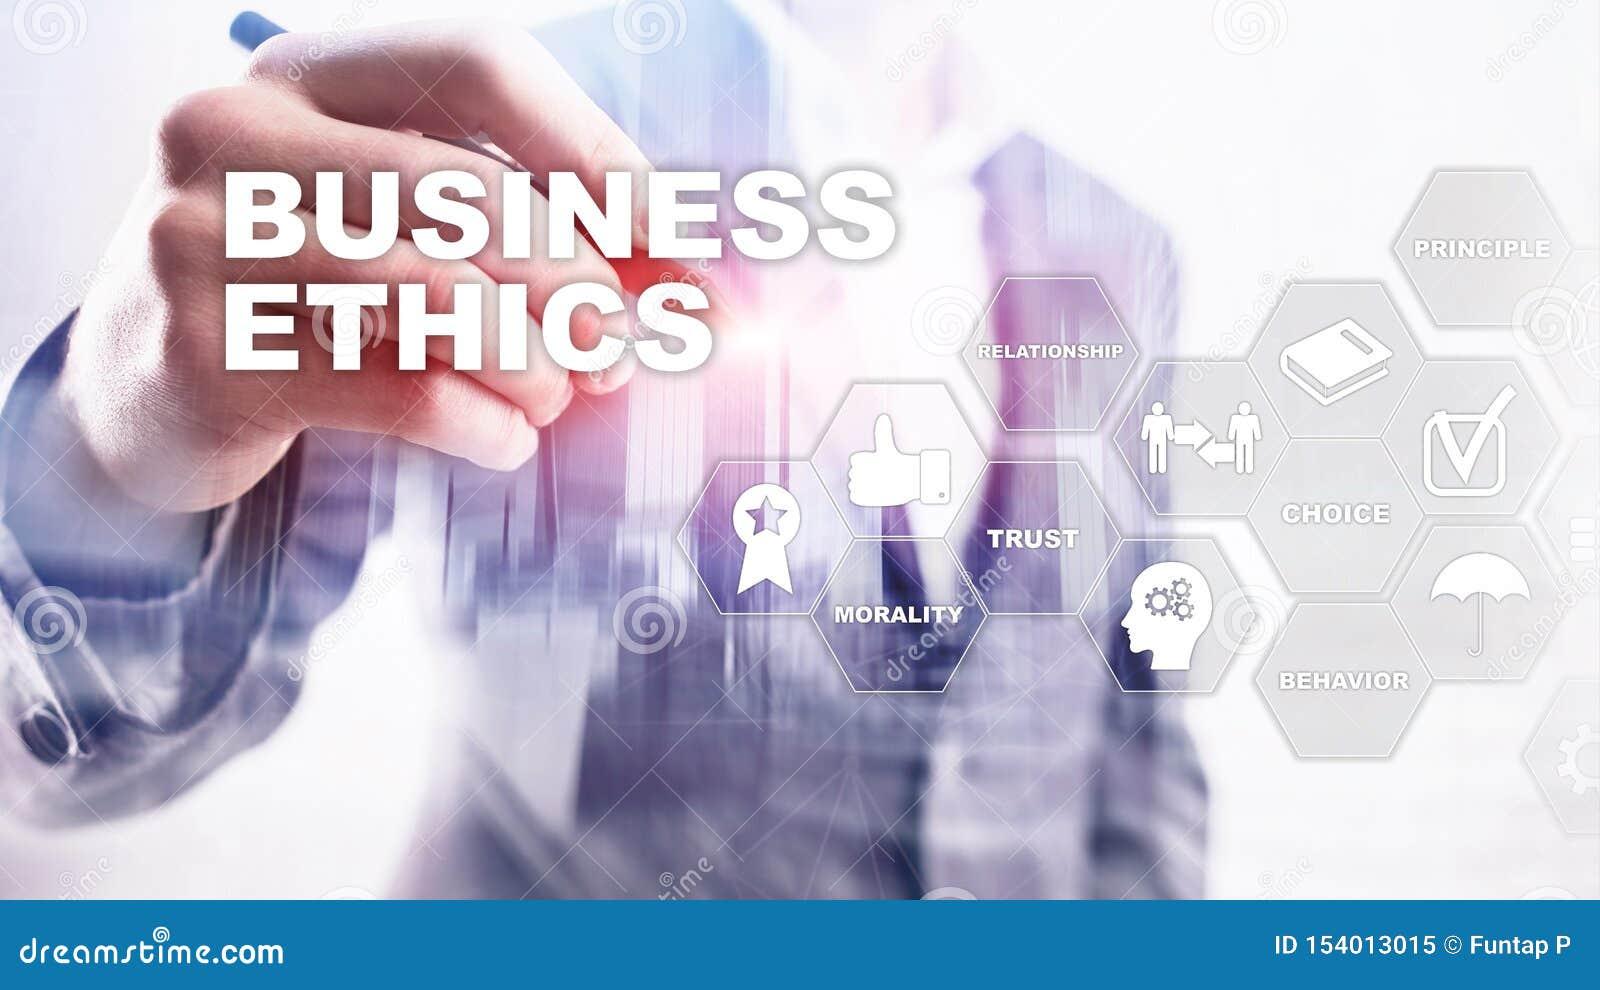 Business Ethnics Philosophy Responsibility Honesty Concept. Mixed media background